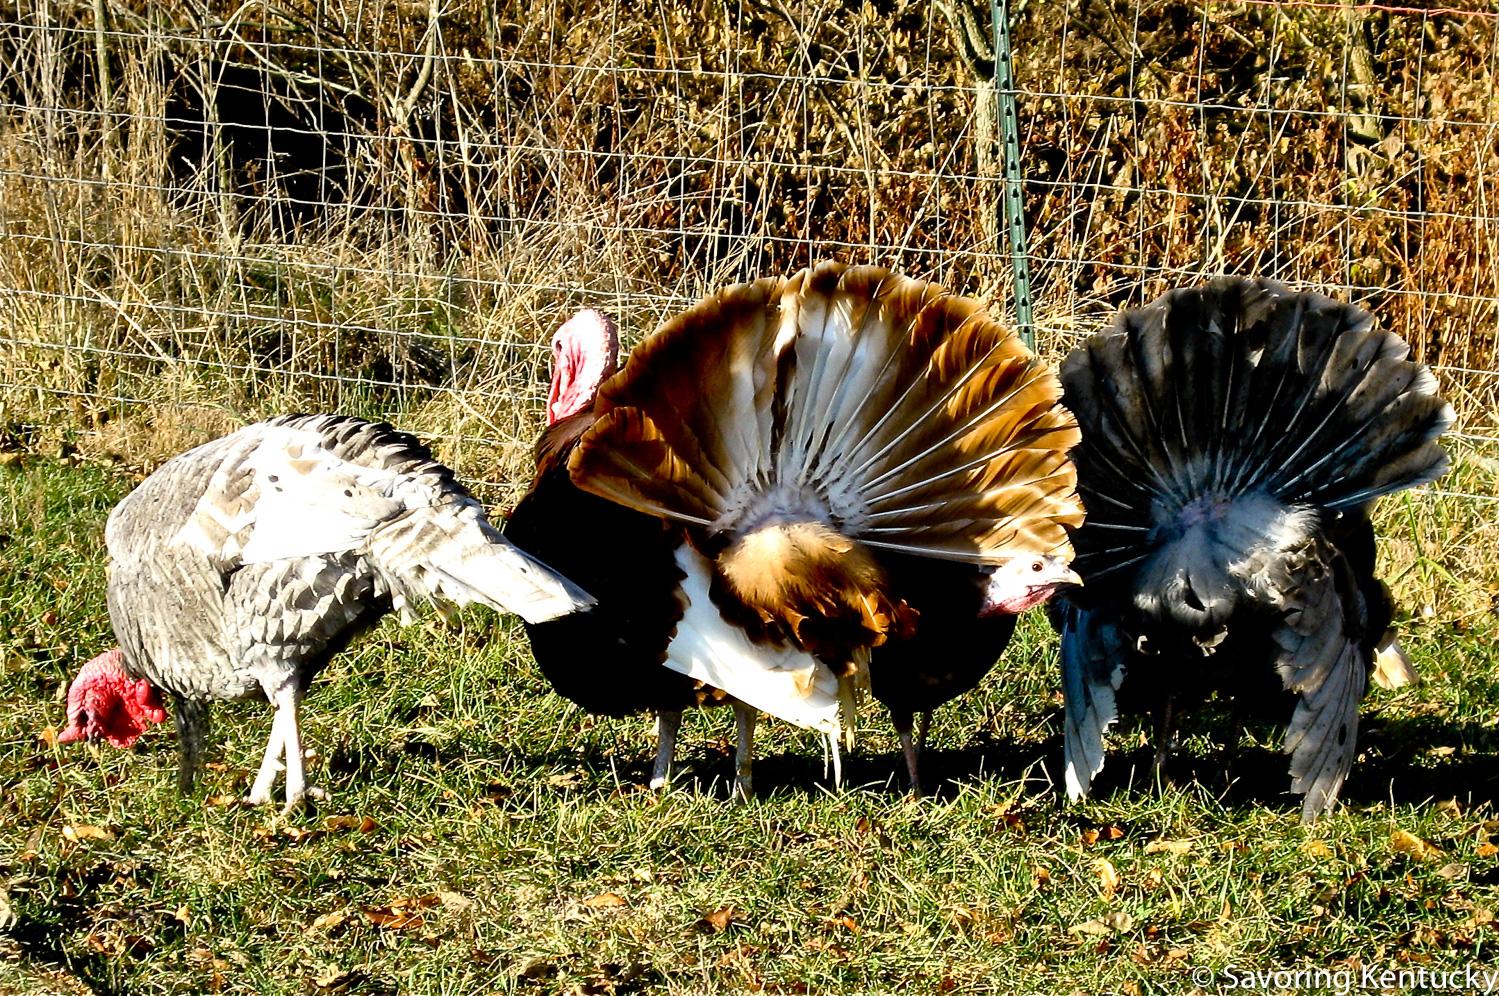 Turkeys on pasture at Elmwood Stock Farm, Georgetown, Kentucky